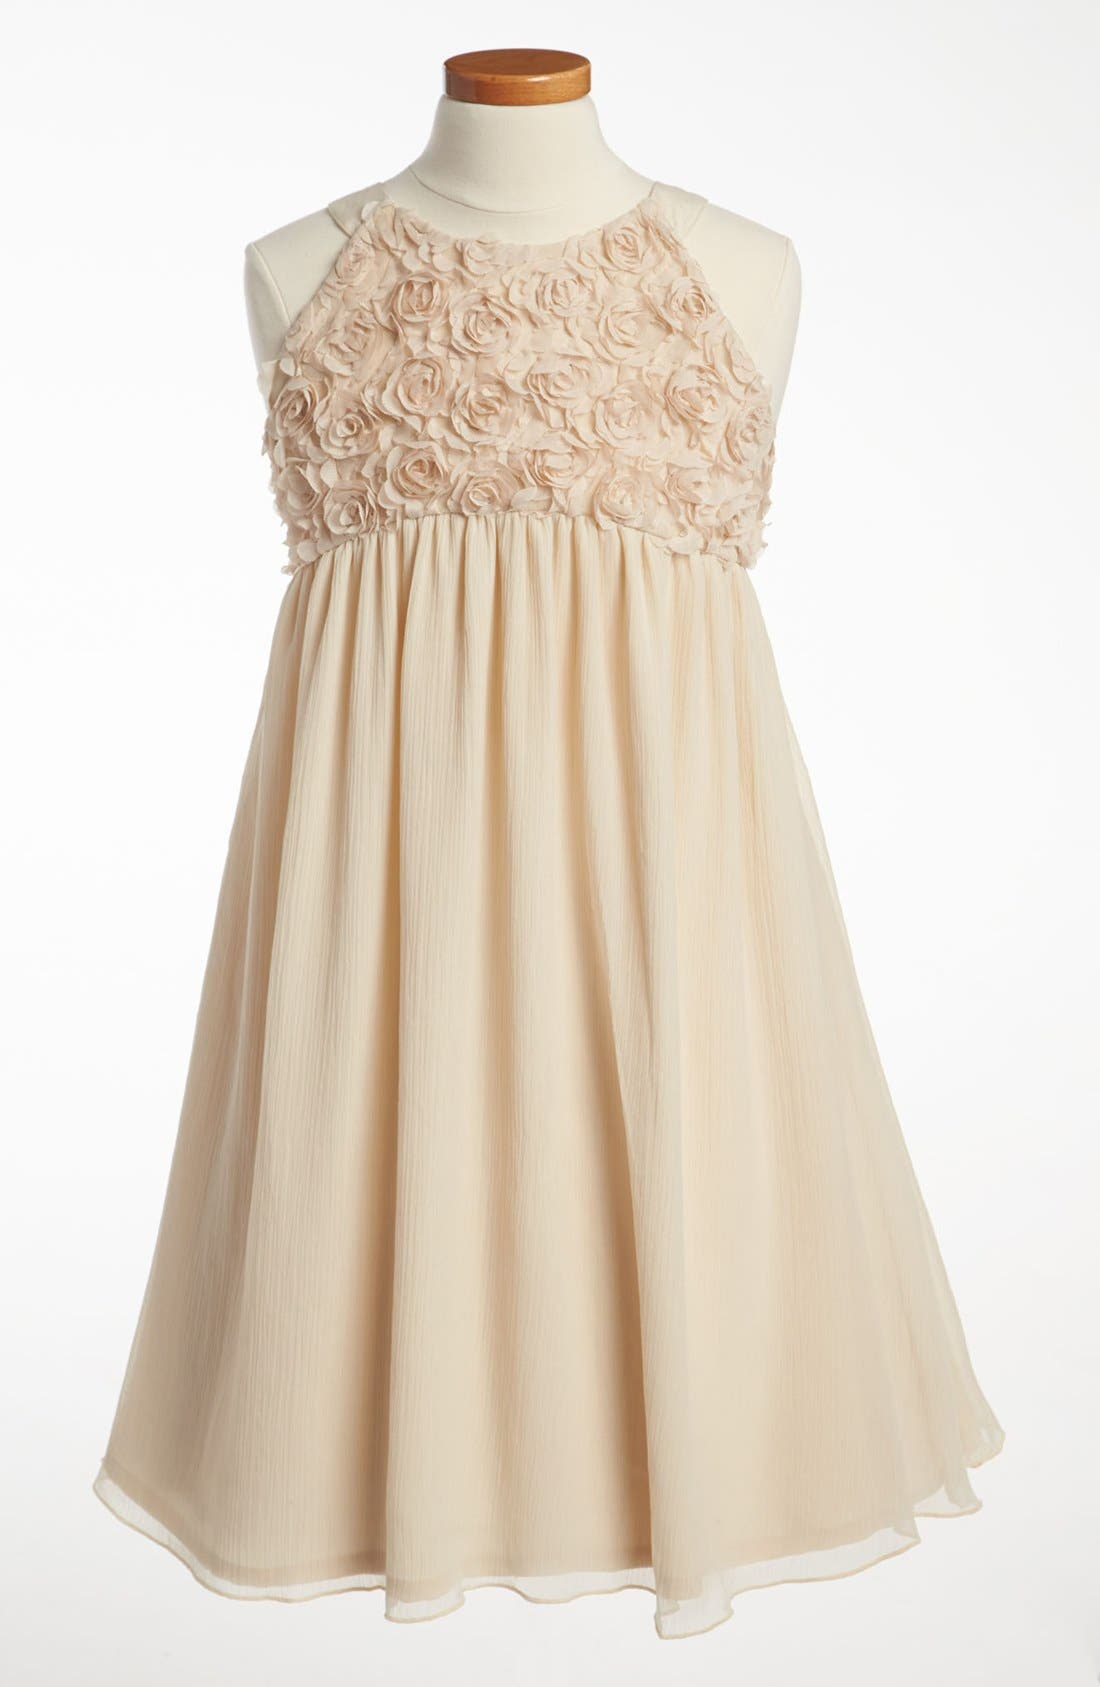 Main Image - Ruby & Bloom 'Selma' Dress (Big Girls)